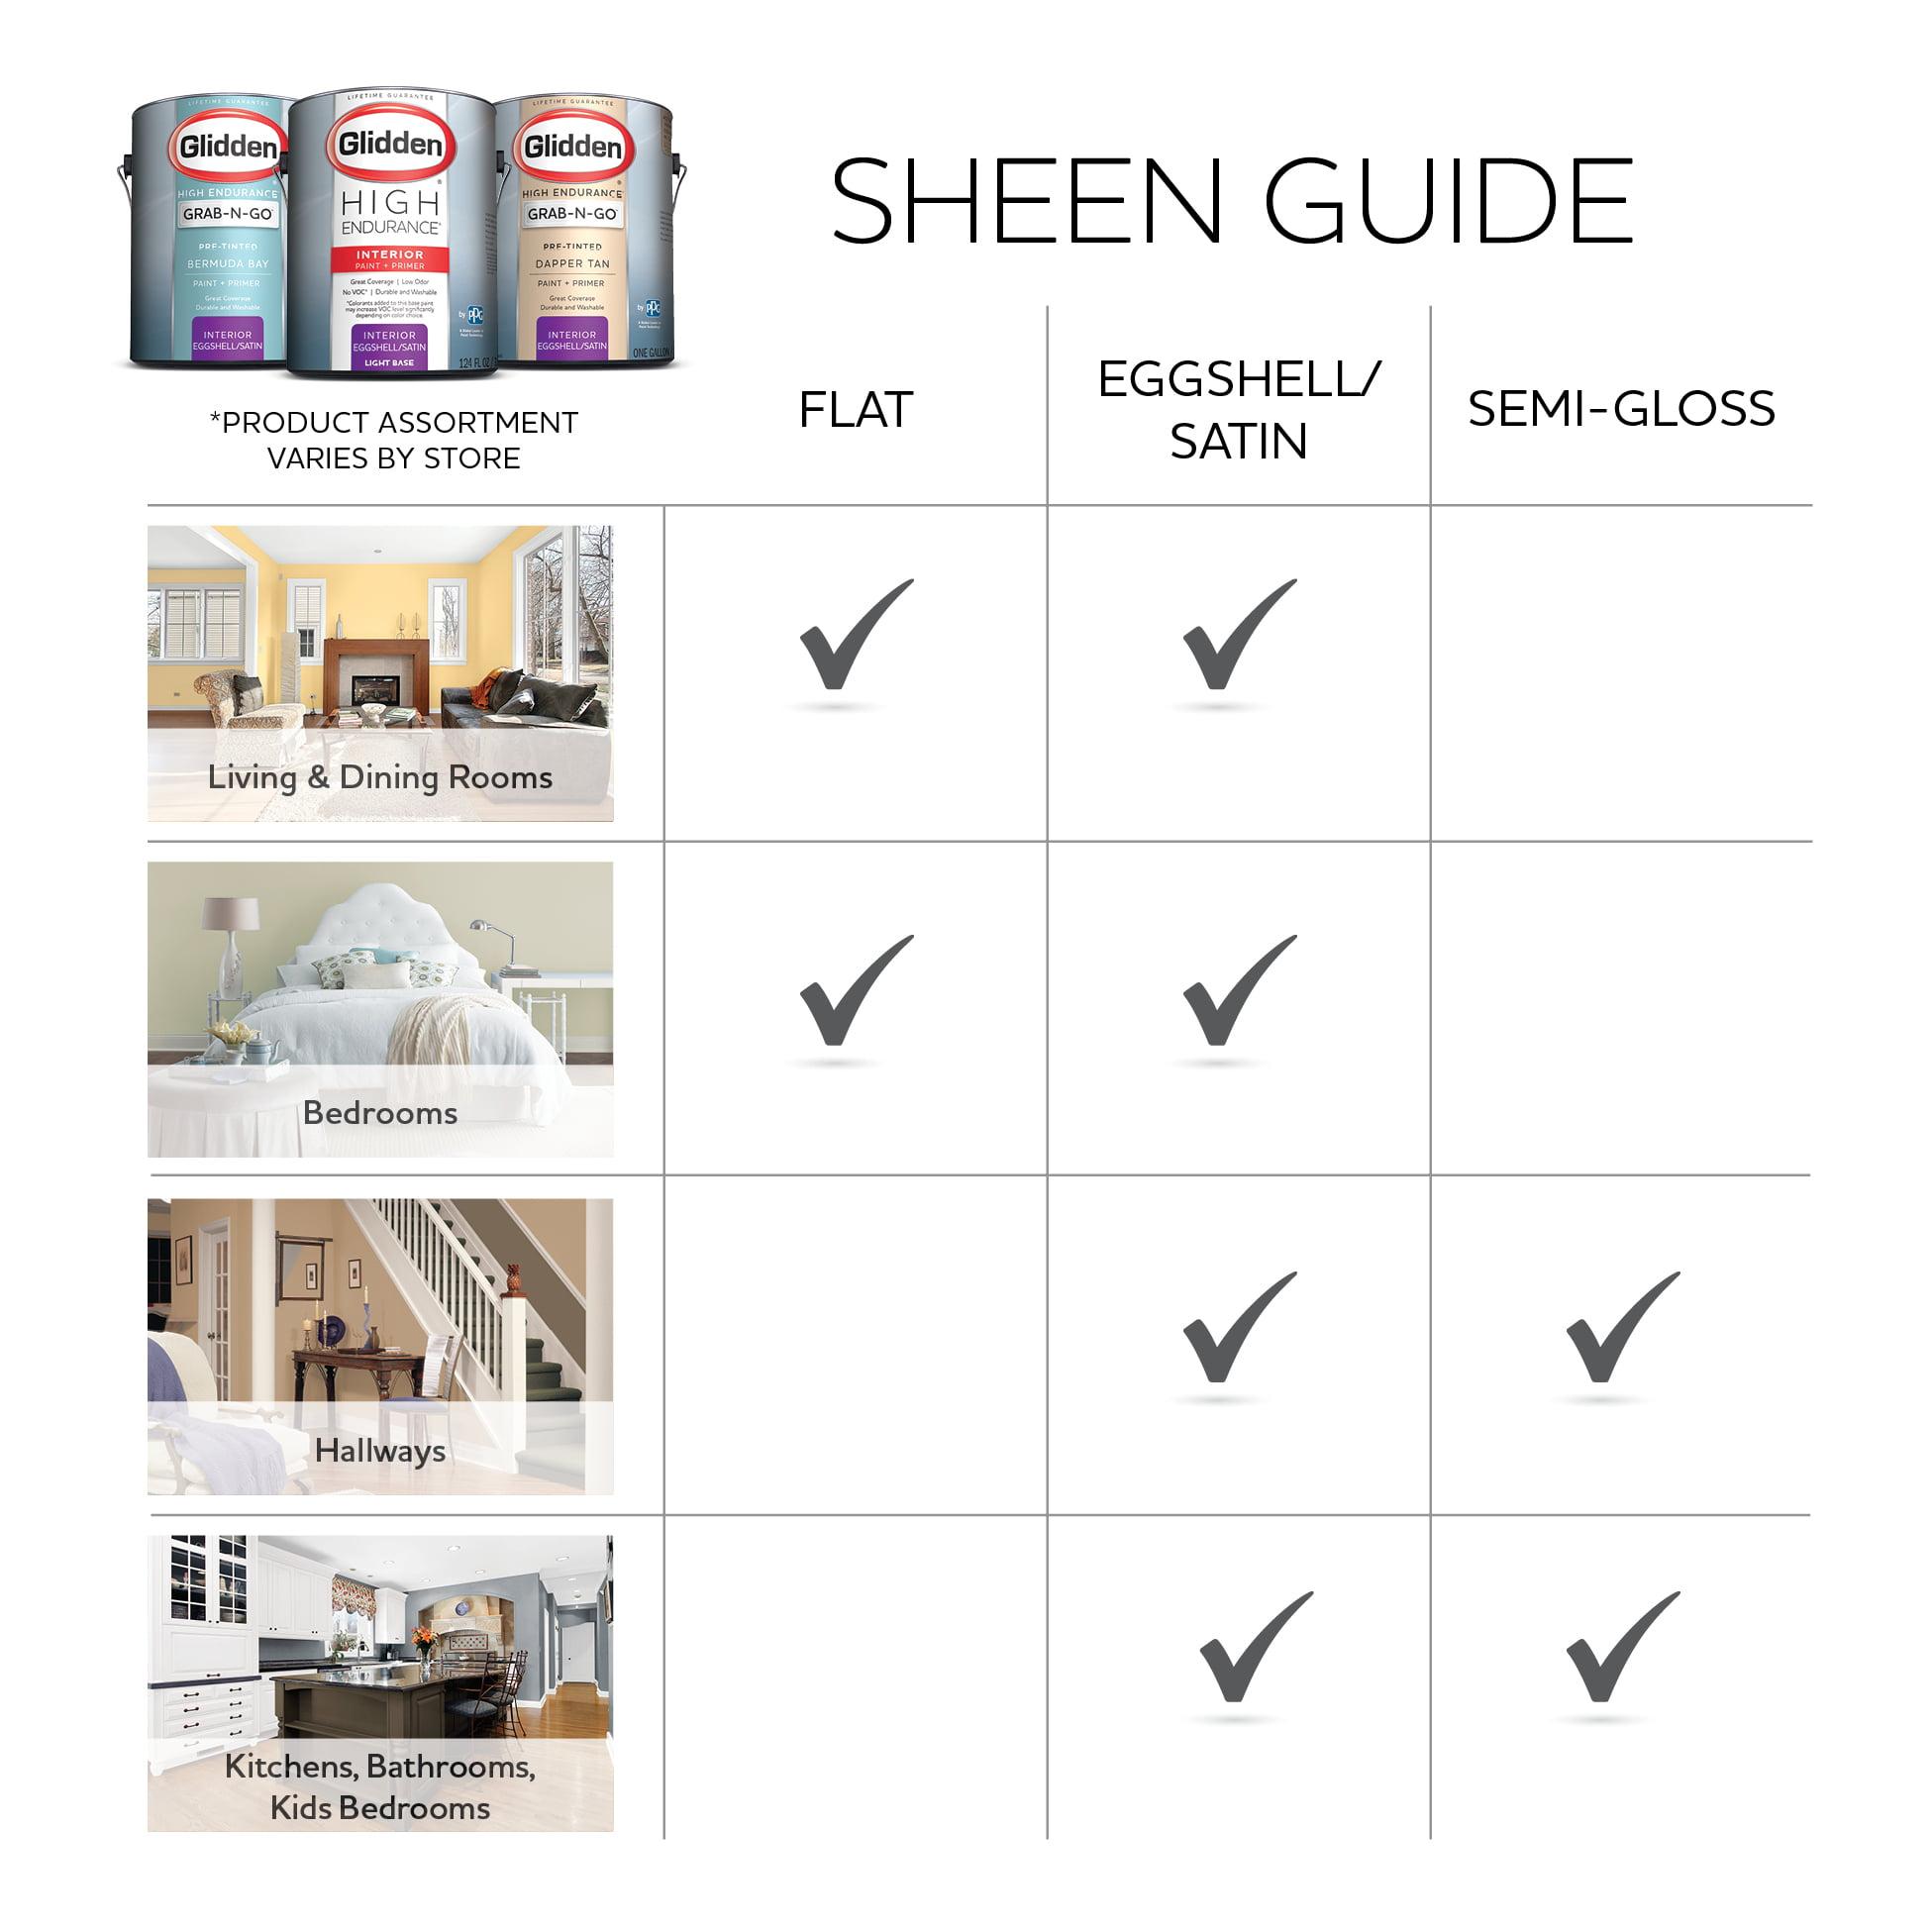 Glidden High Endurance Grab N Go, Interior Paint And Primer, Eggshell  Finish, Dapper Tan, 1 Gallon   Walmart.com